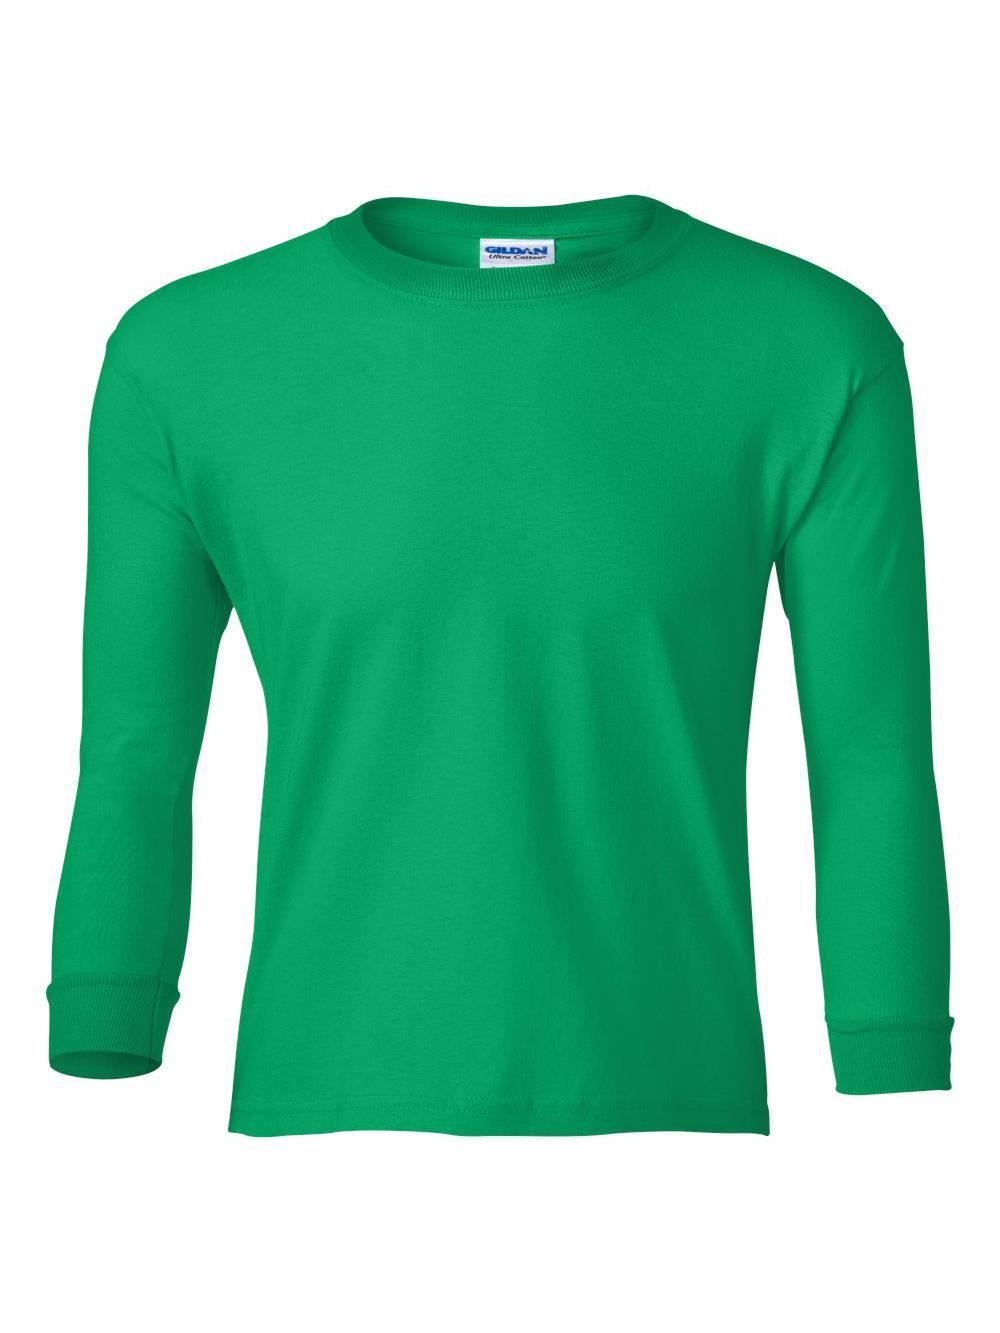 Gildan-Ultra-Cotton-Youth-Long-Sleeve-T-Shirt-2400B thumbnail 12